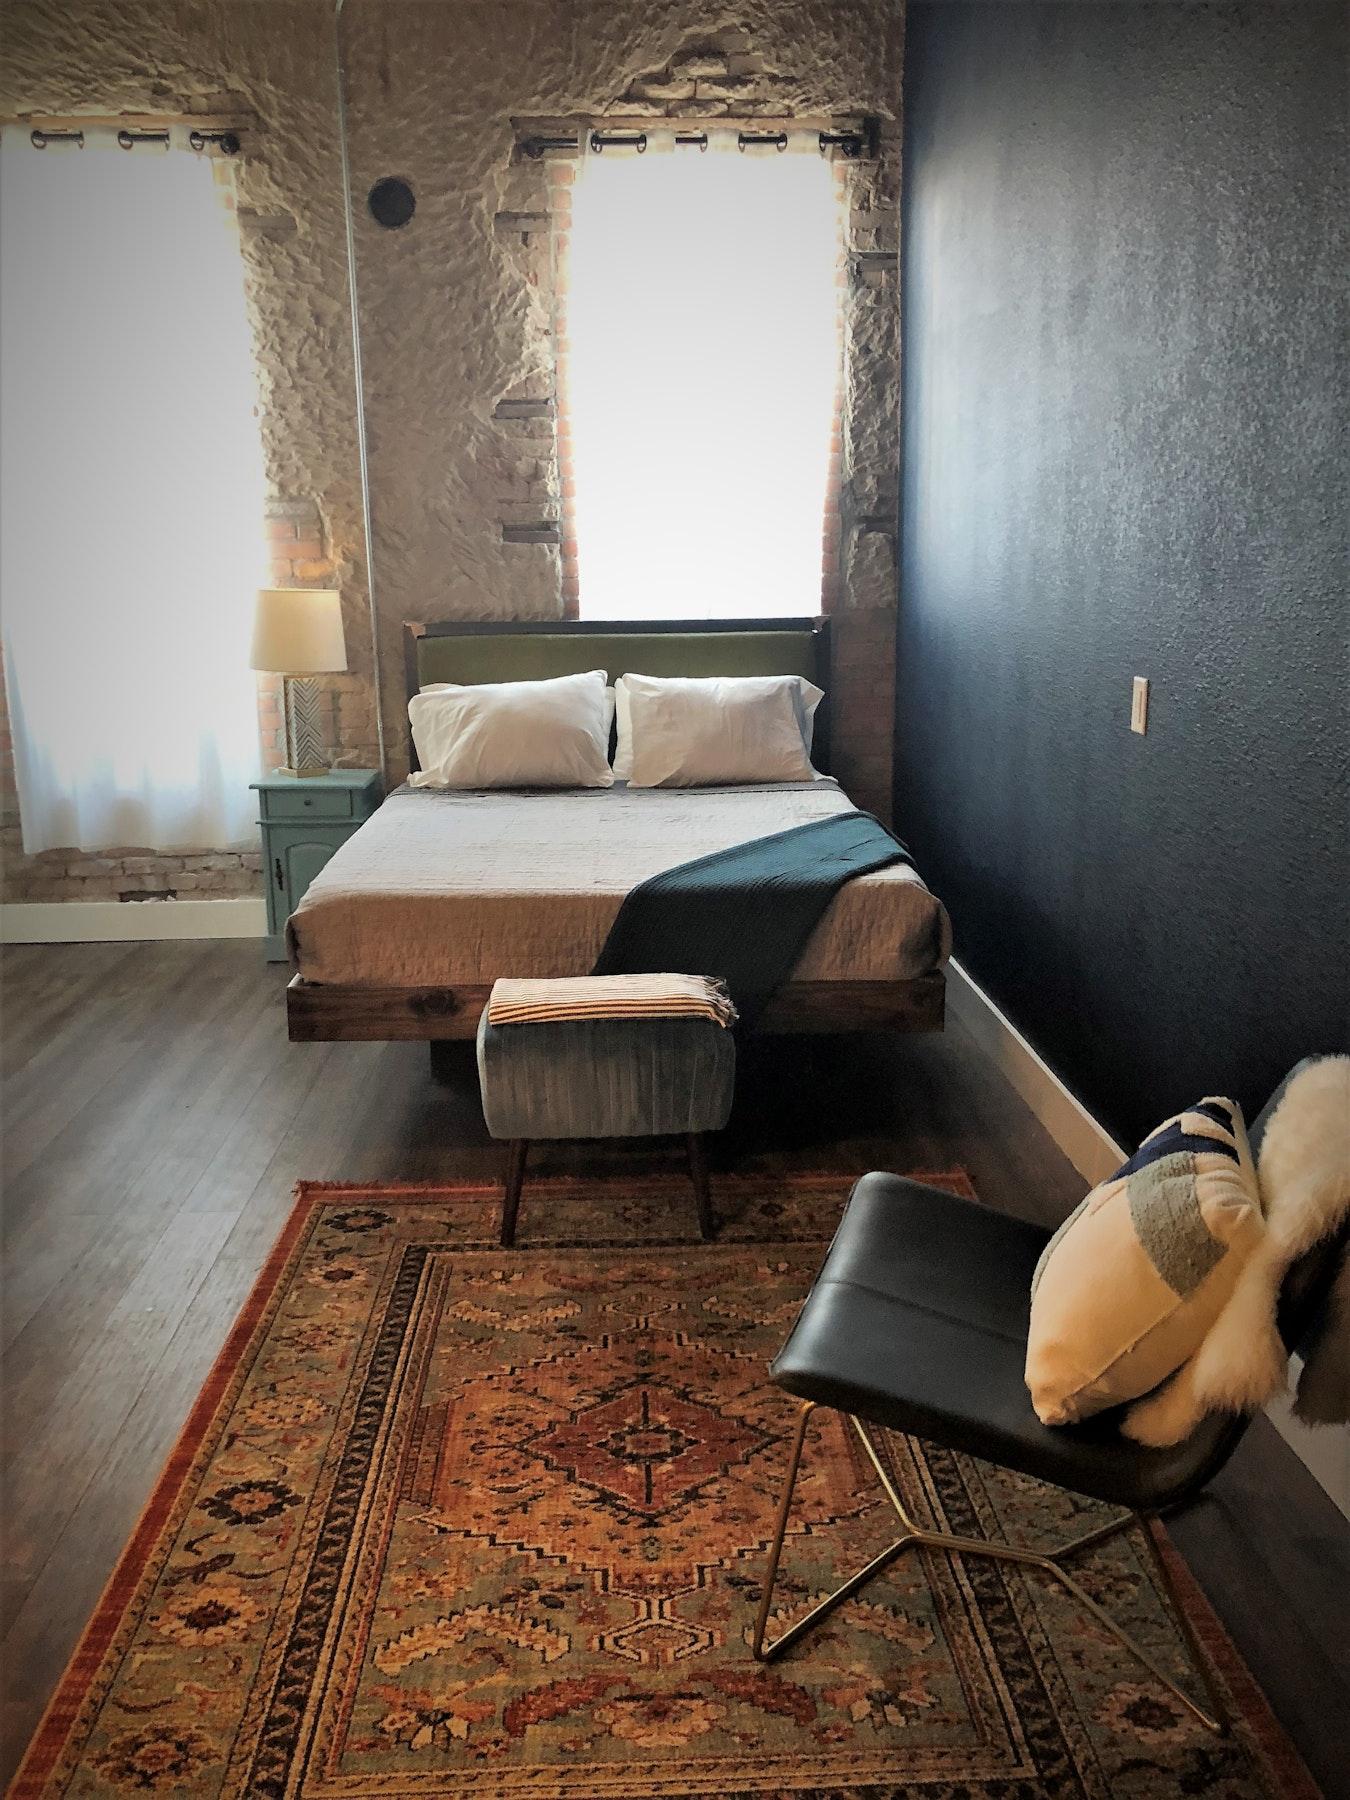 Deep Ellum Hostel in Beyond Dallas